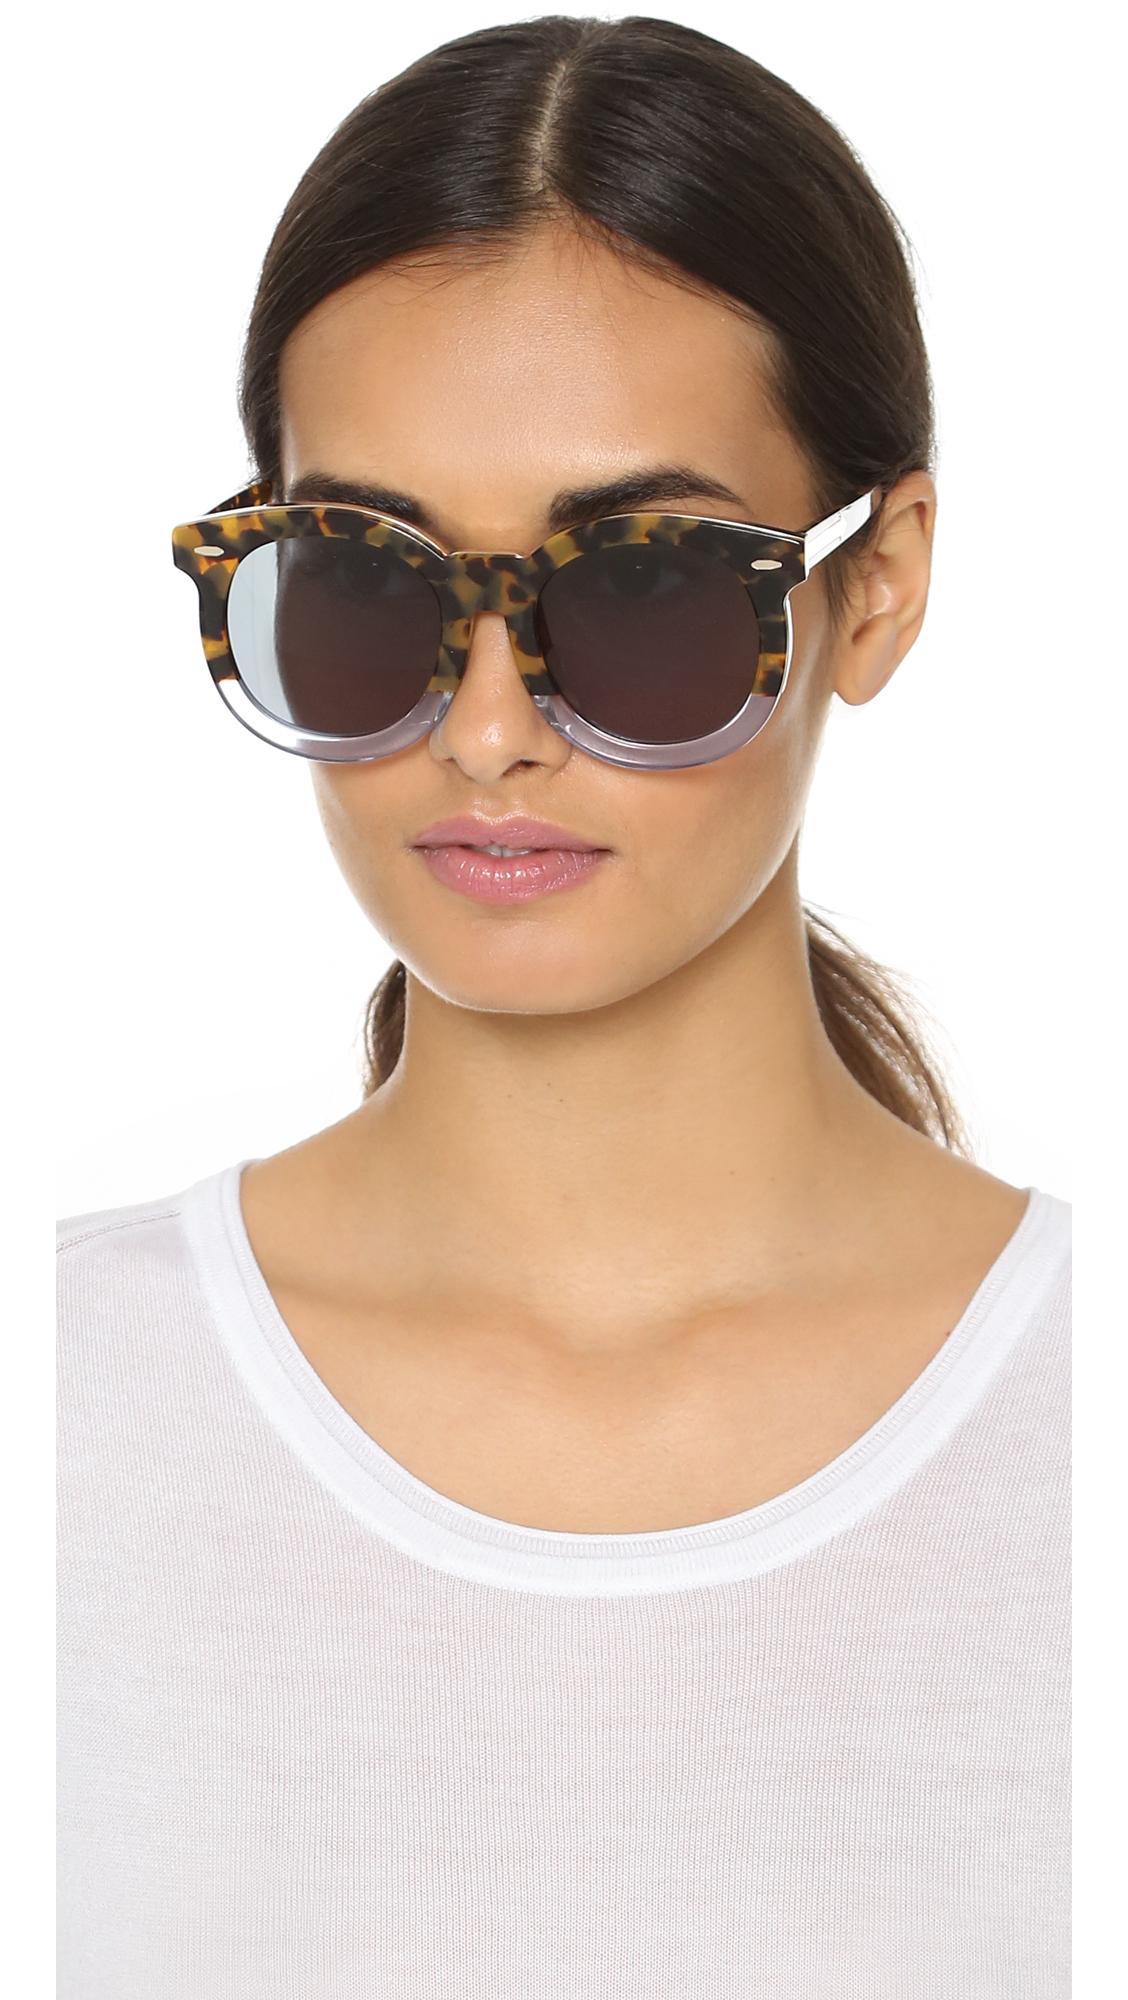 e5b08caaccb7 Lyst - Karen Walker Special Fit Super Duper Thistle Sunglasses in Brown